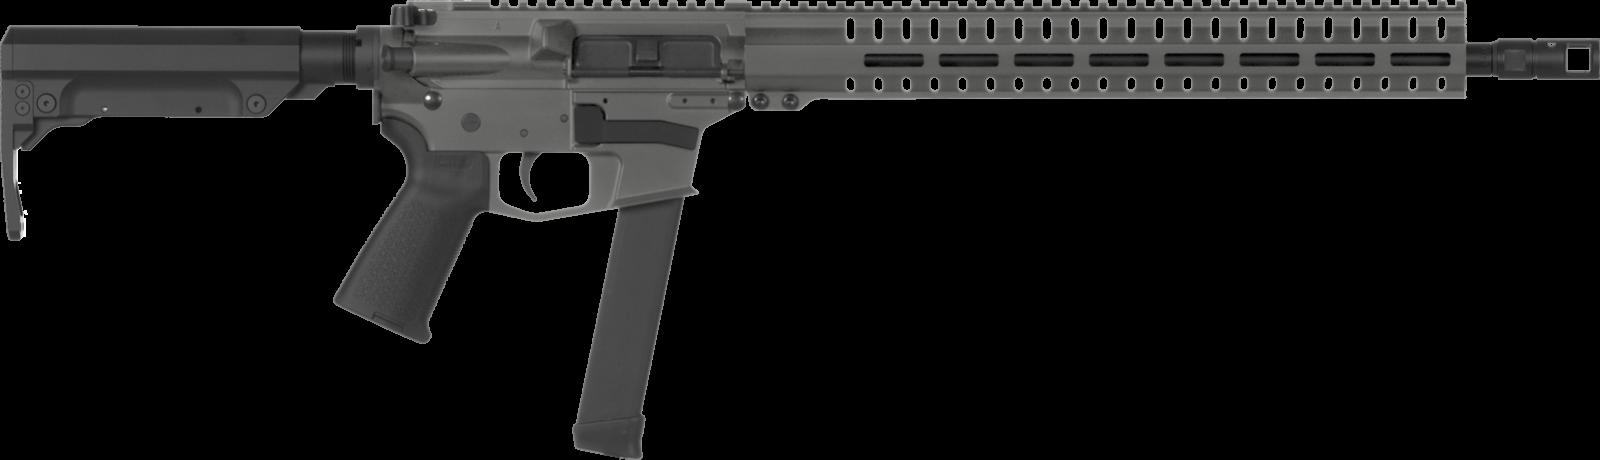 Samonabíjecí puška CMMG Resolute 200 Rifle MkGs - 9 x 19, šedá